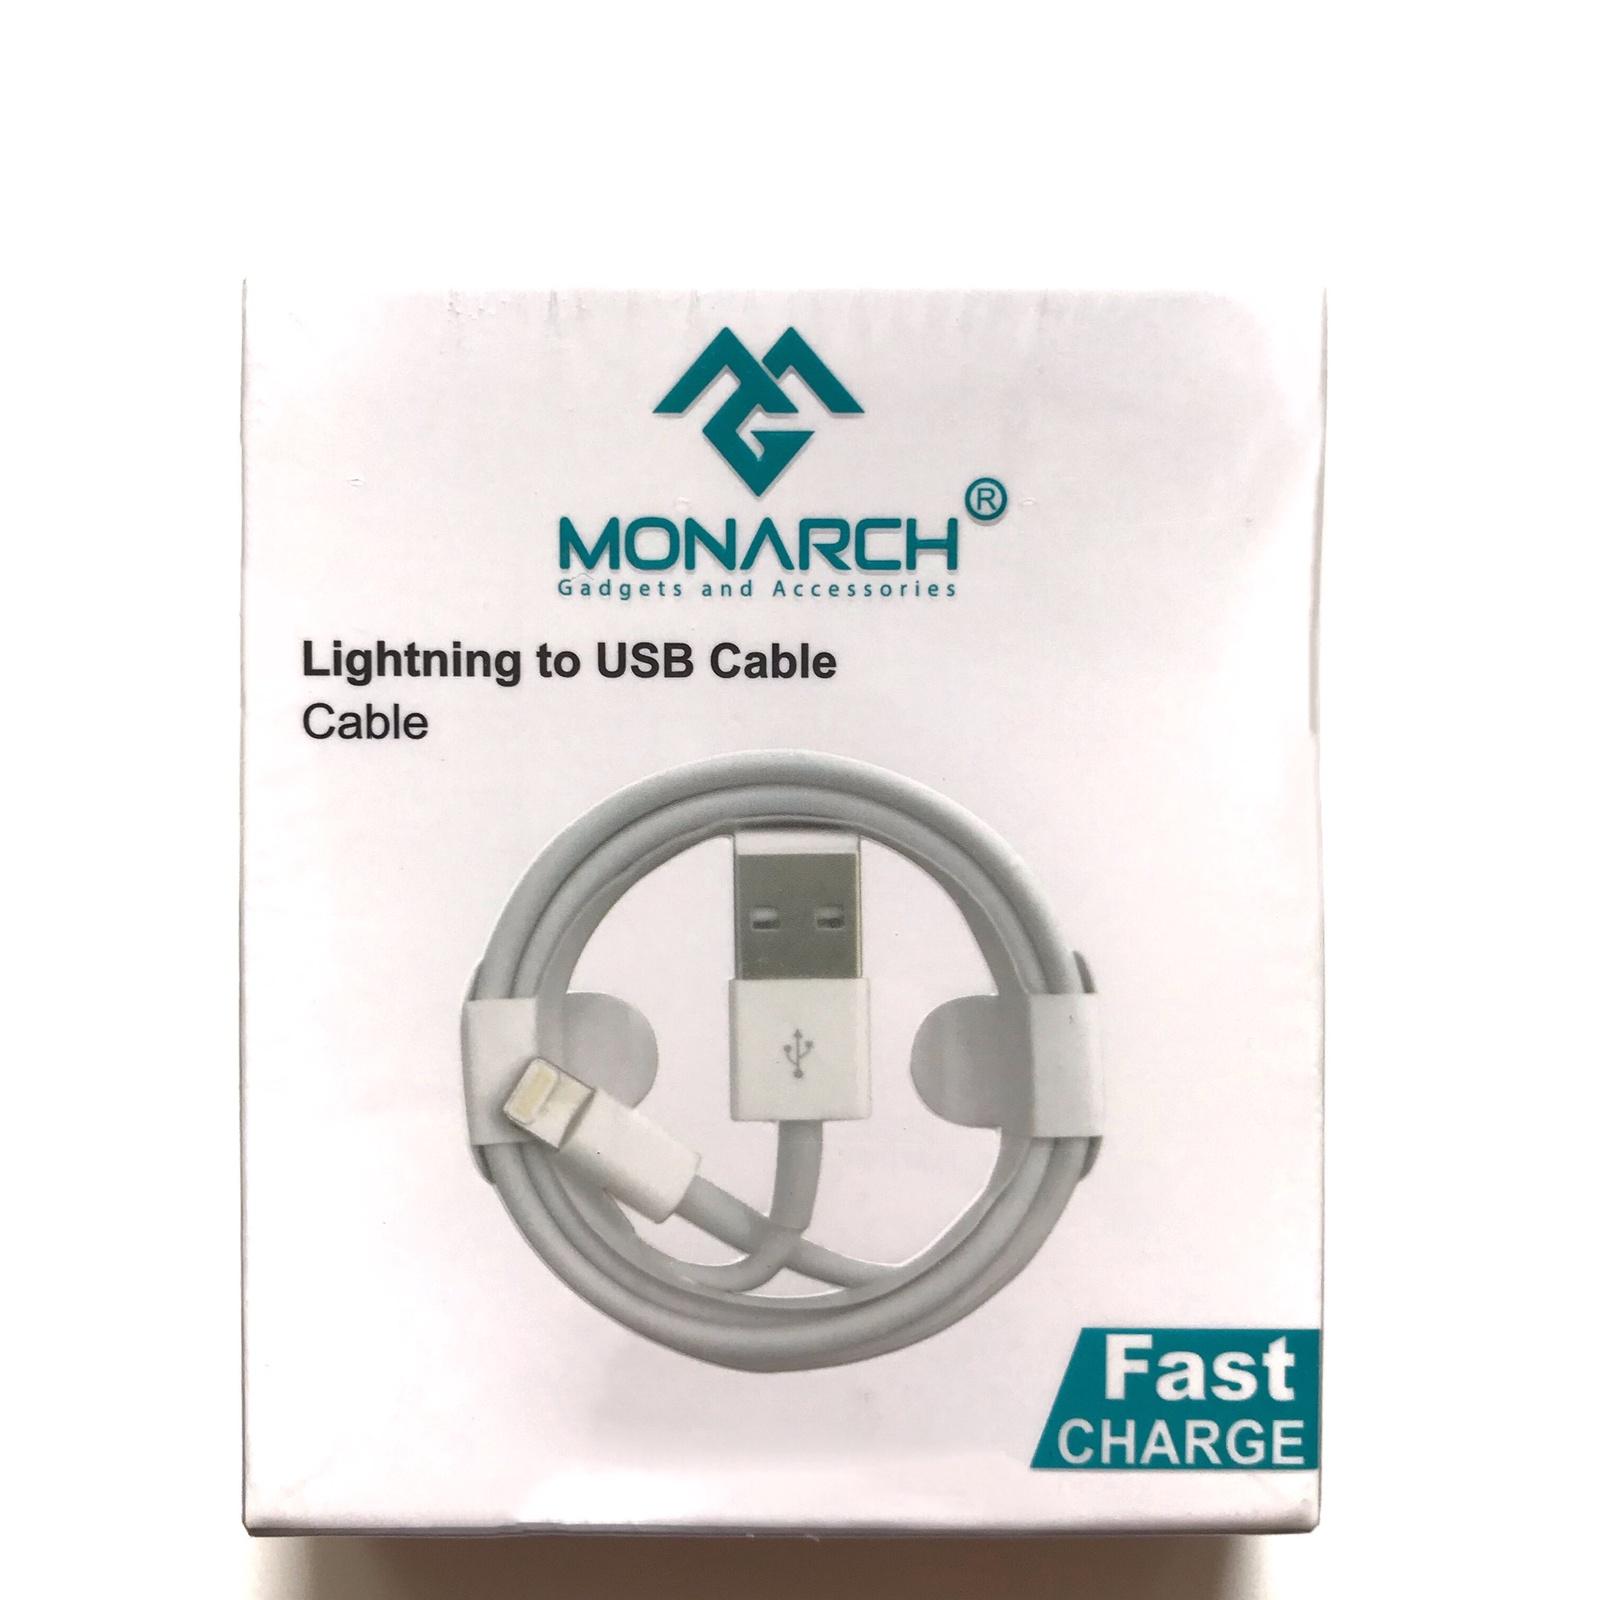 Кабель Monarch USB Fast Charge для зарядки и синхронизации